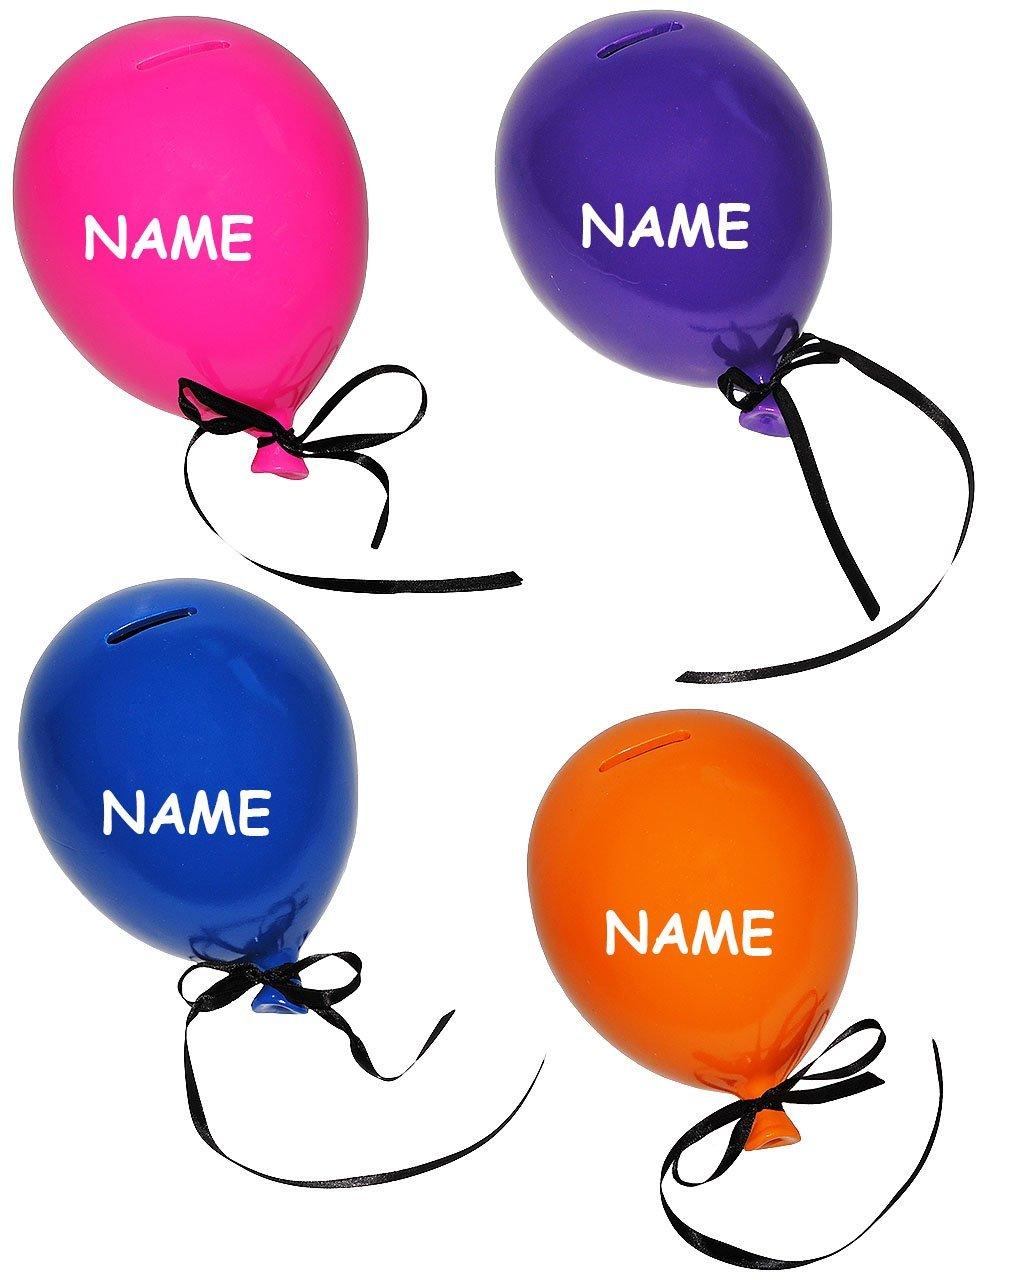 Unbekannt 4 TLG. Set  XL Spardose - bunter Luftballonn - incl. Namen - stabile Sparbüchse - aus Porzellan   Keramik - Sparschwein lustig witzig orange   lila   rosa   b..